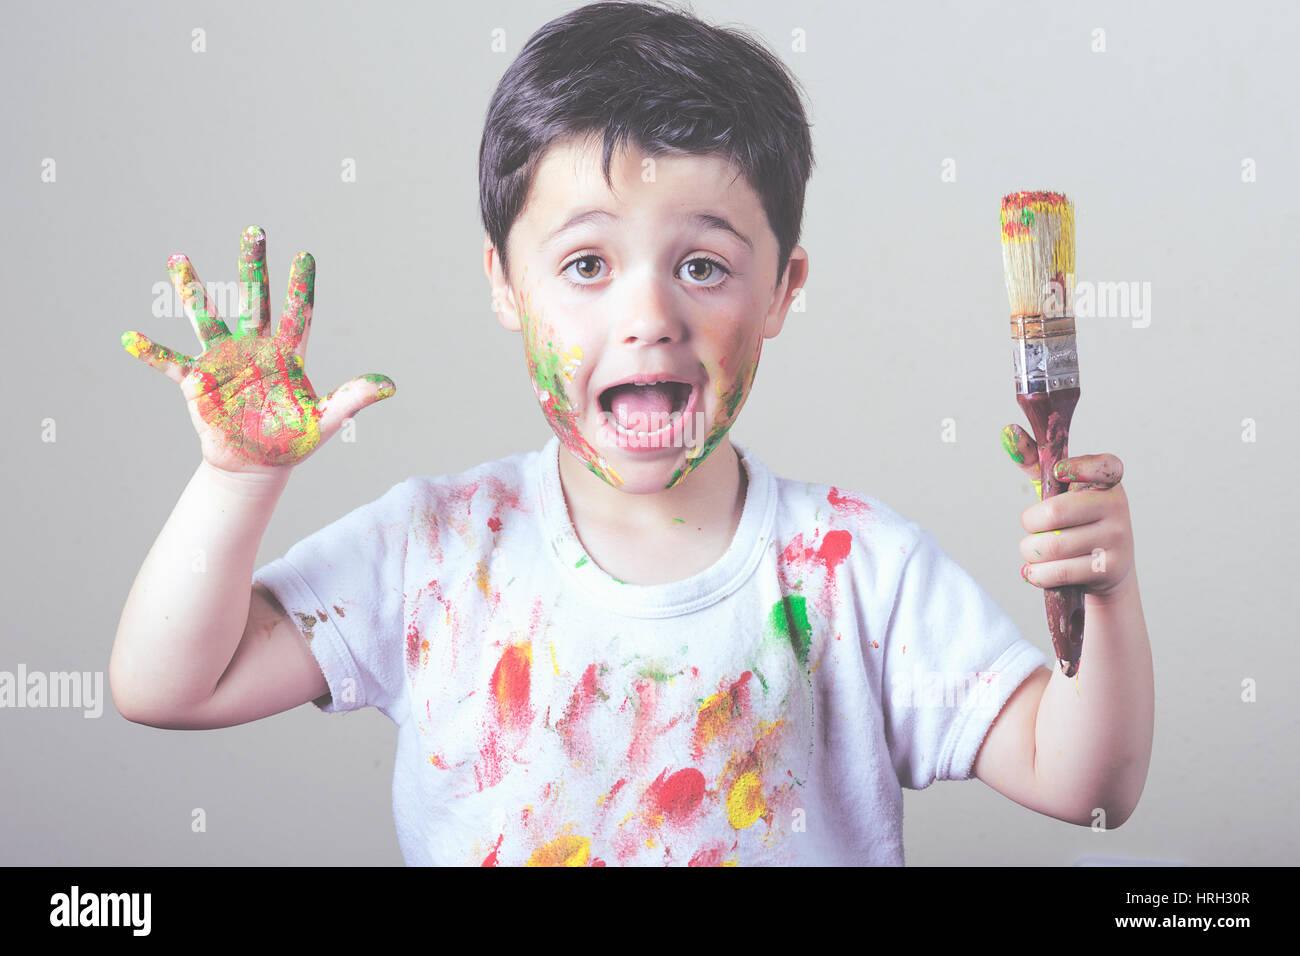 c42c9f0a651a Mischief Child Draw Stock Photos   Mischief Child Draw Stock Images ...